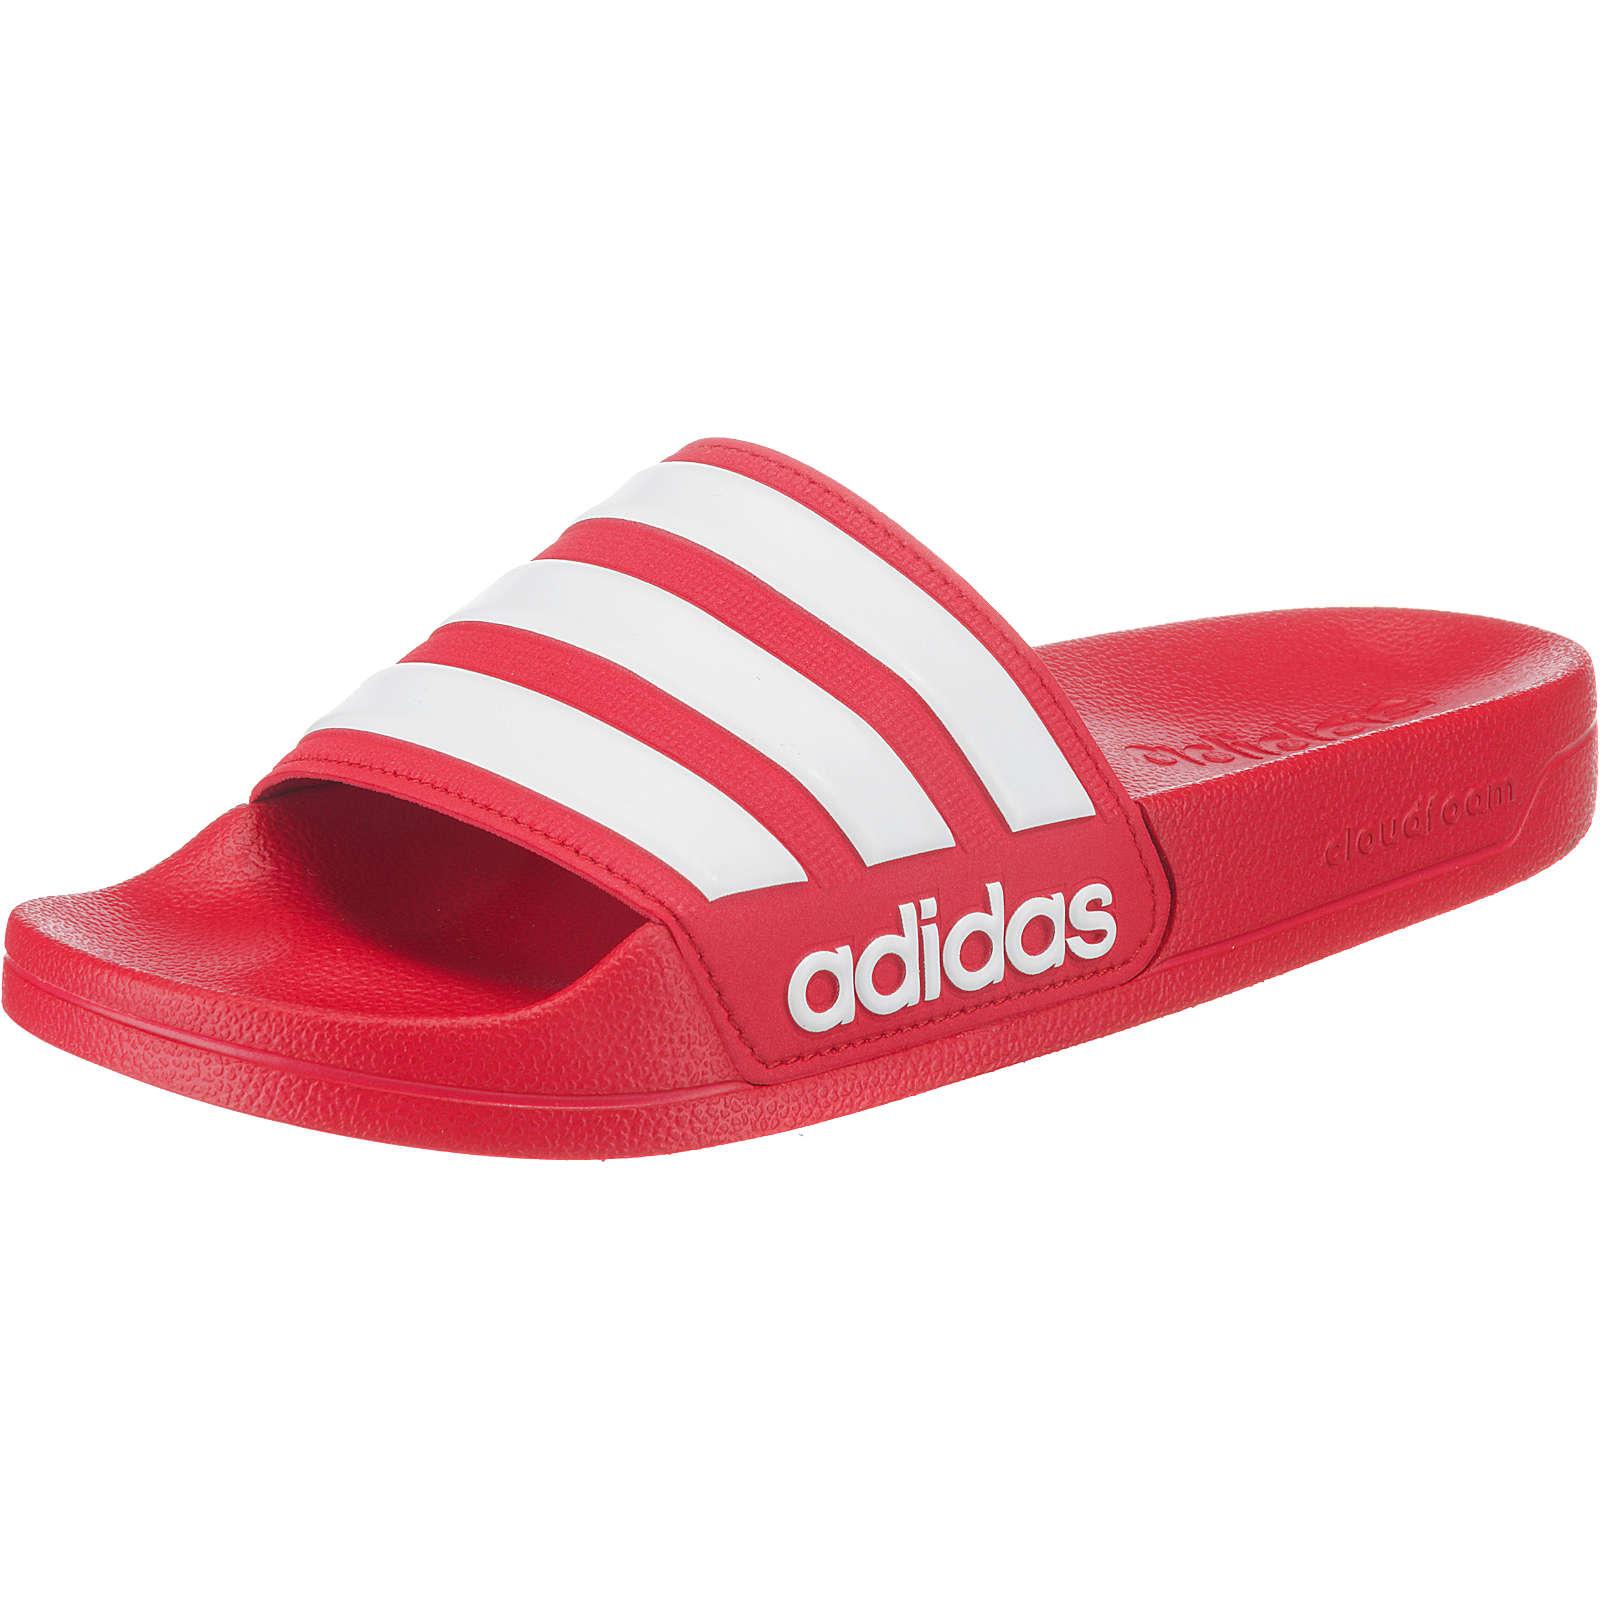 adidas Performance CF Adilette Pantoletten rot Damen Gr. 44,5